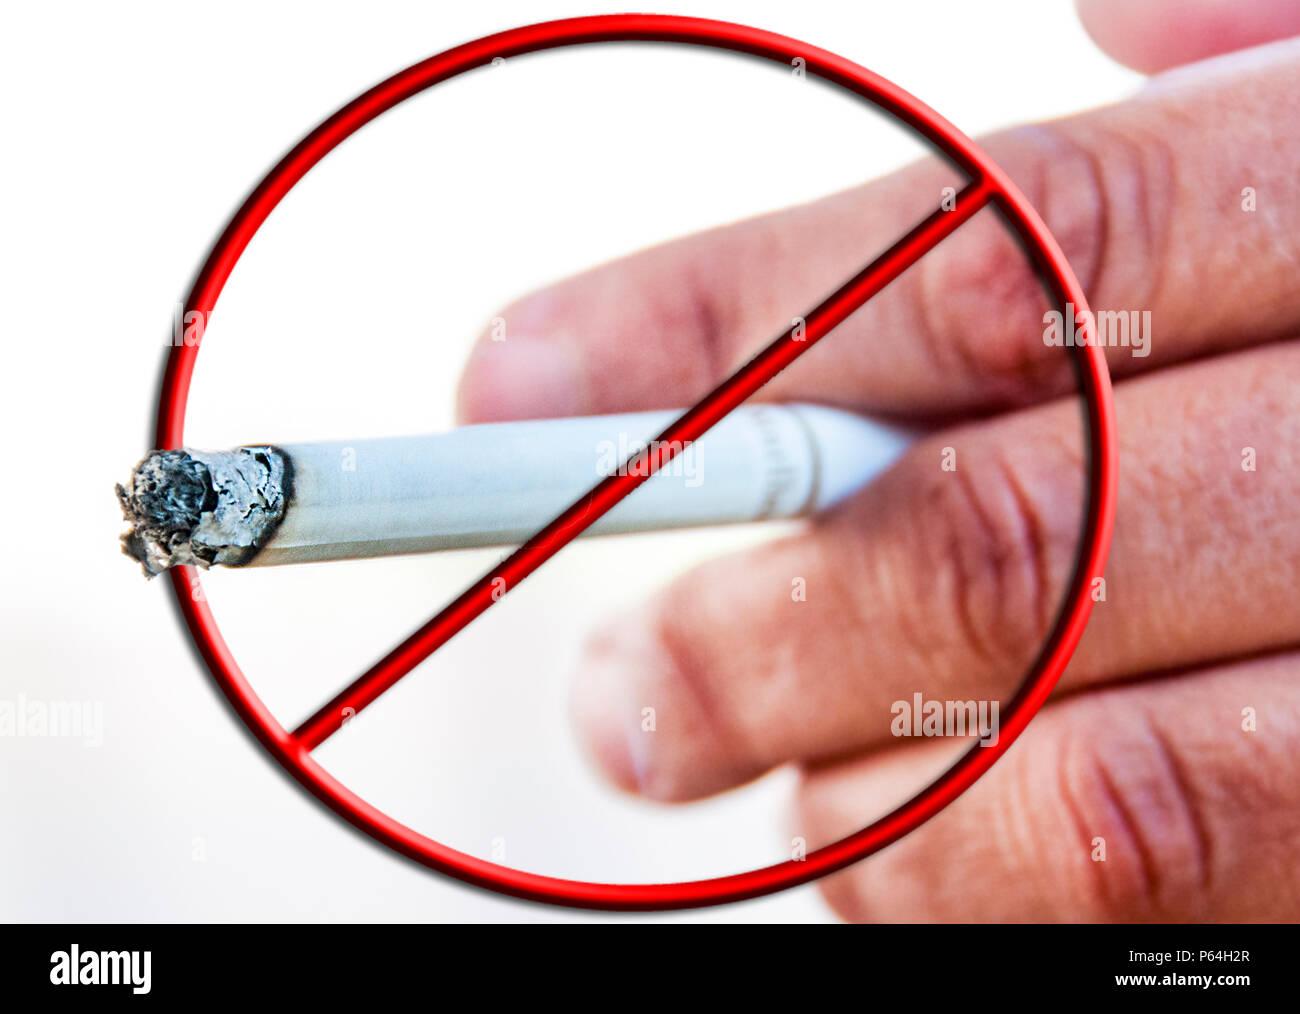 Buy USA duty paid cigarettes